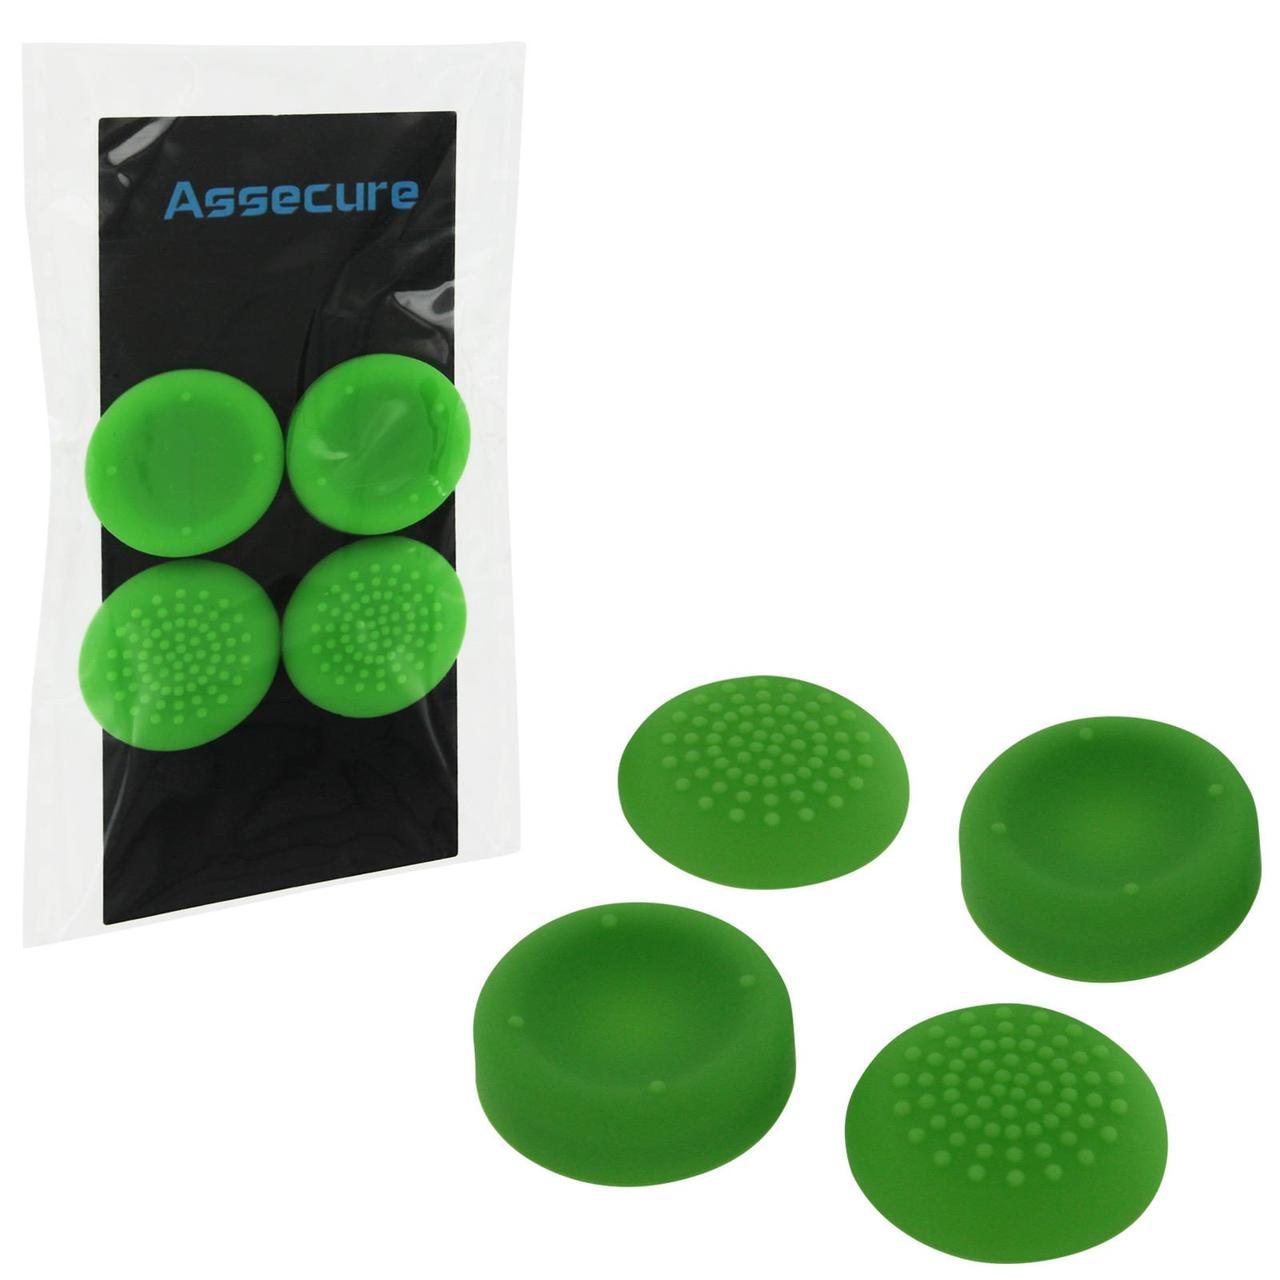 Силіконові насадки Assecure для геймпадів Dualshock 4 (Green)